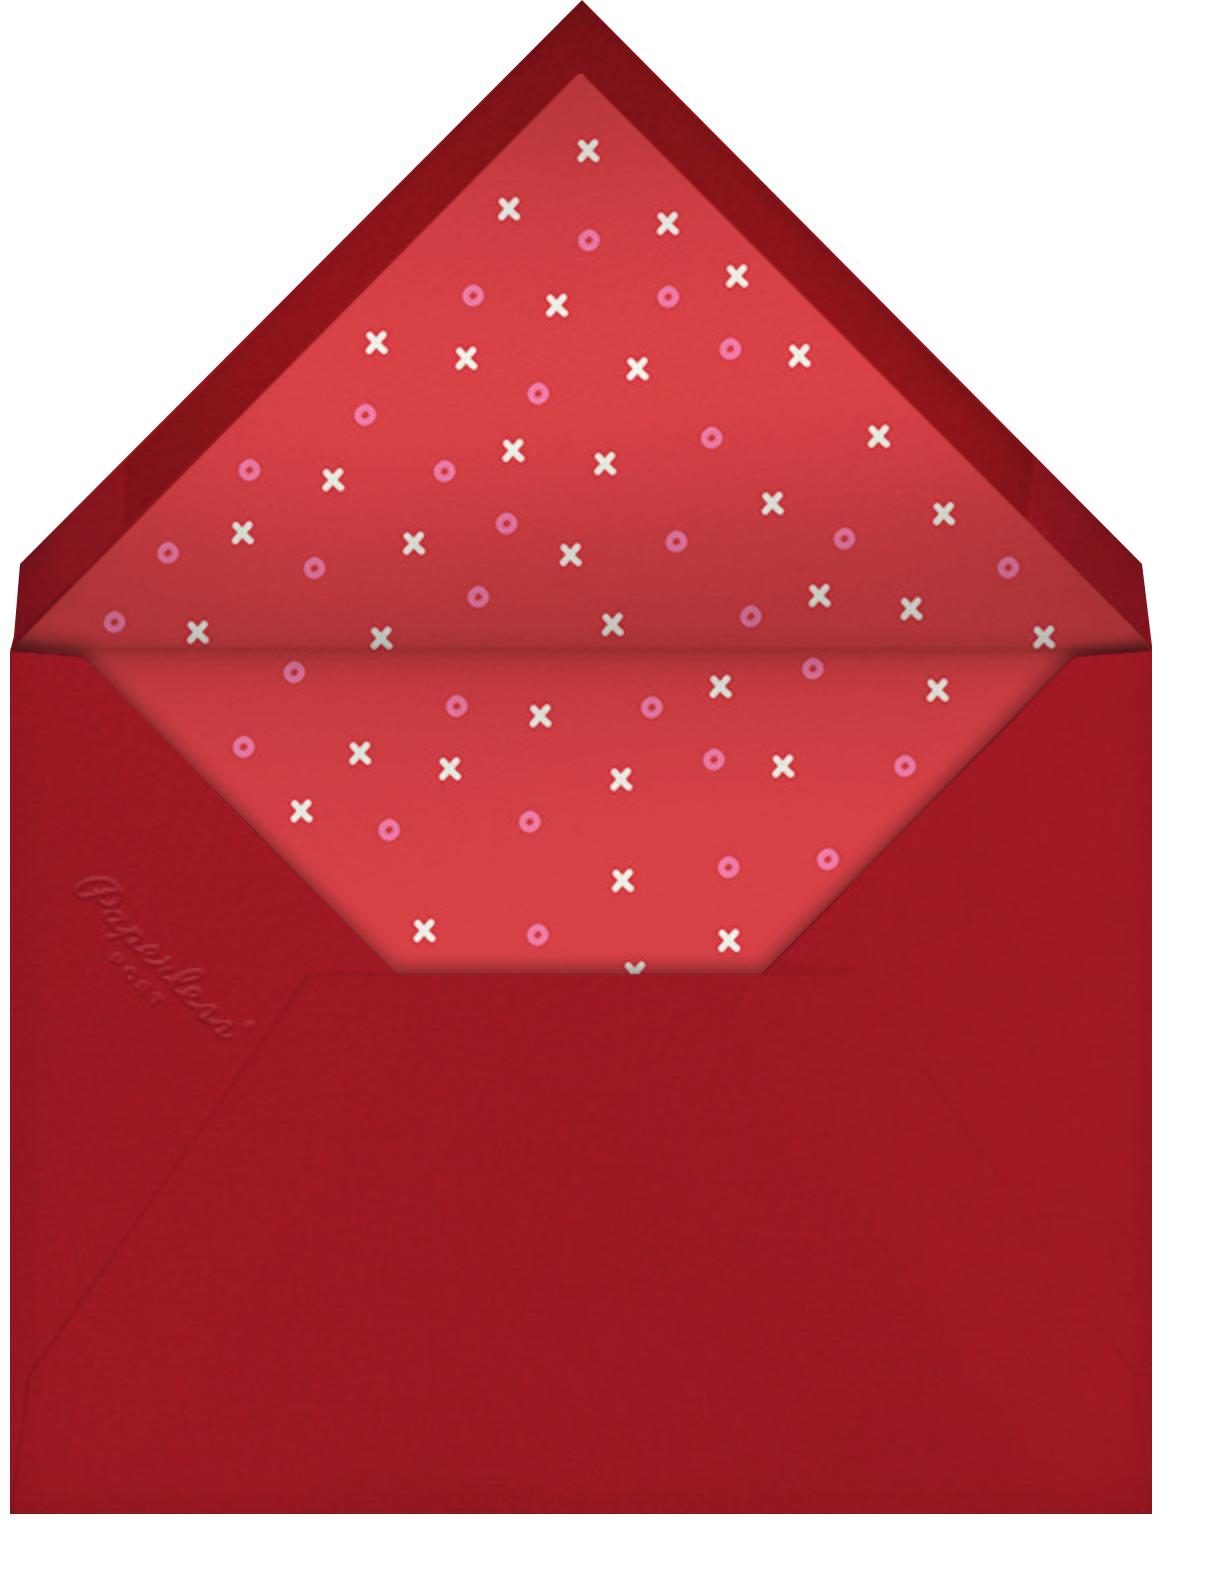 I - Like Like - You - Paperless Post - Envelope